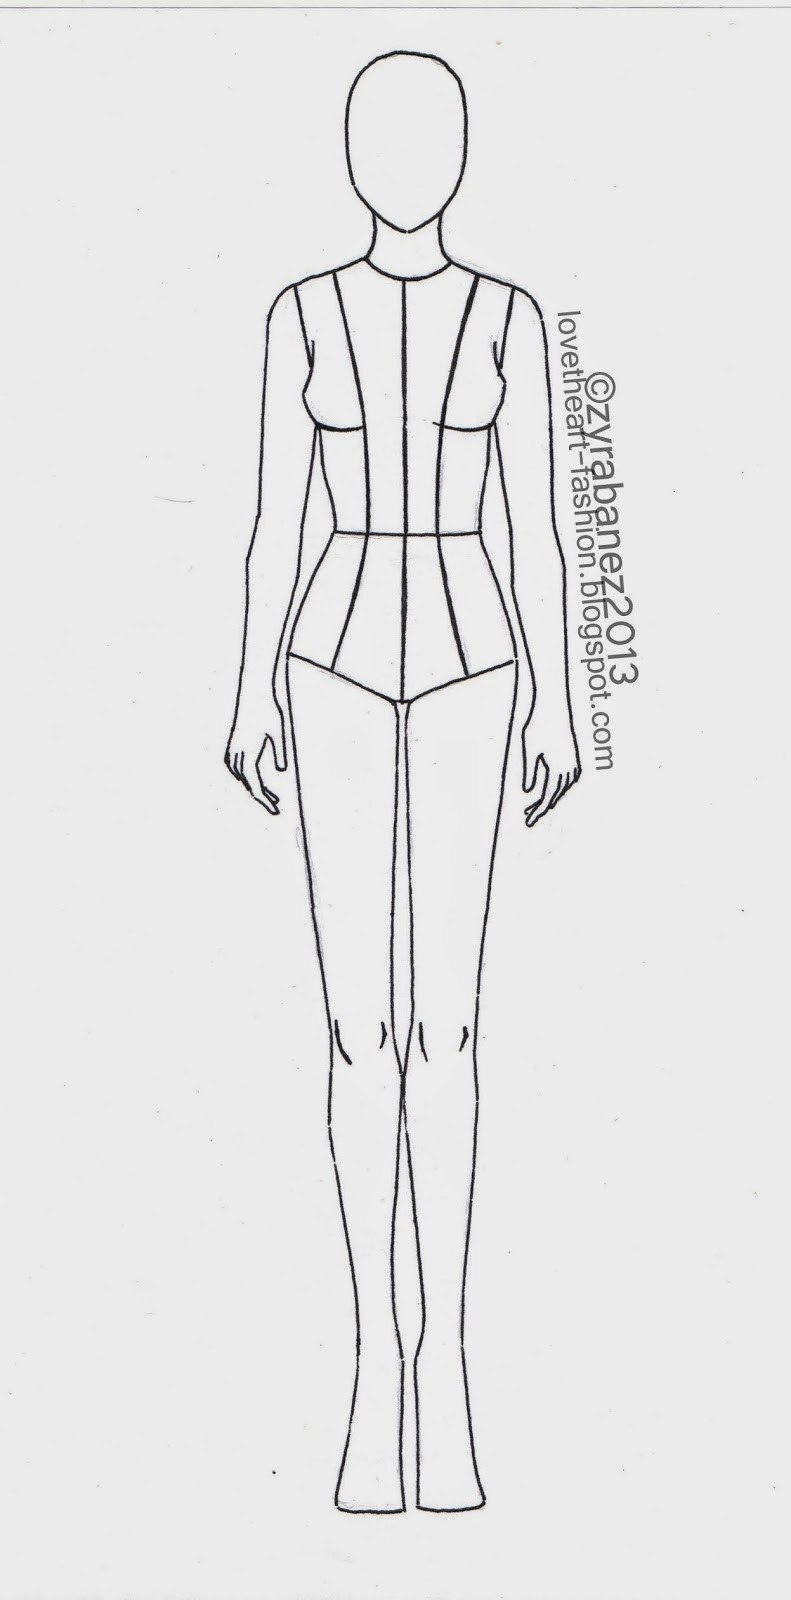 Body Template for Fashion Design Zyra Bañez August 2013